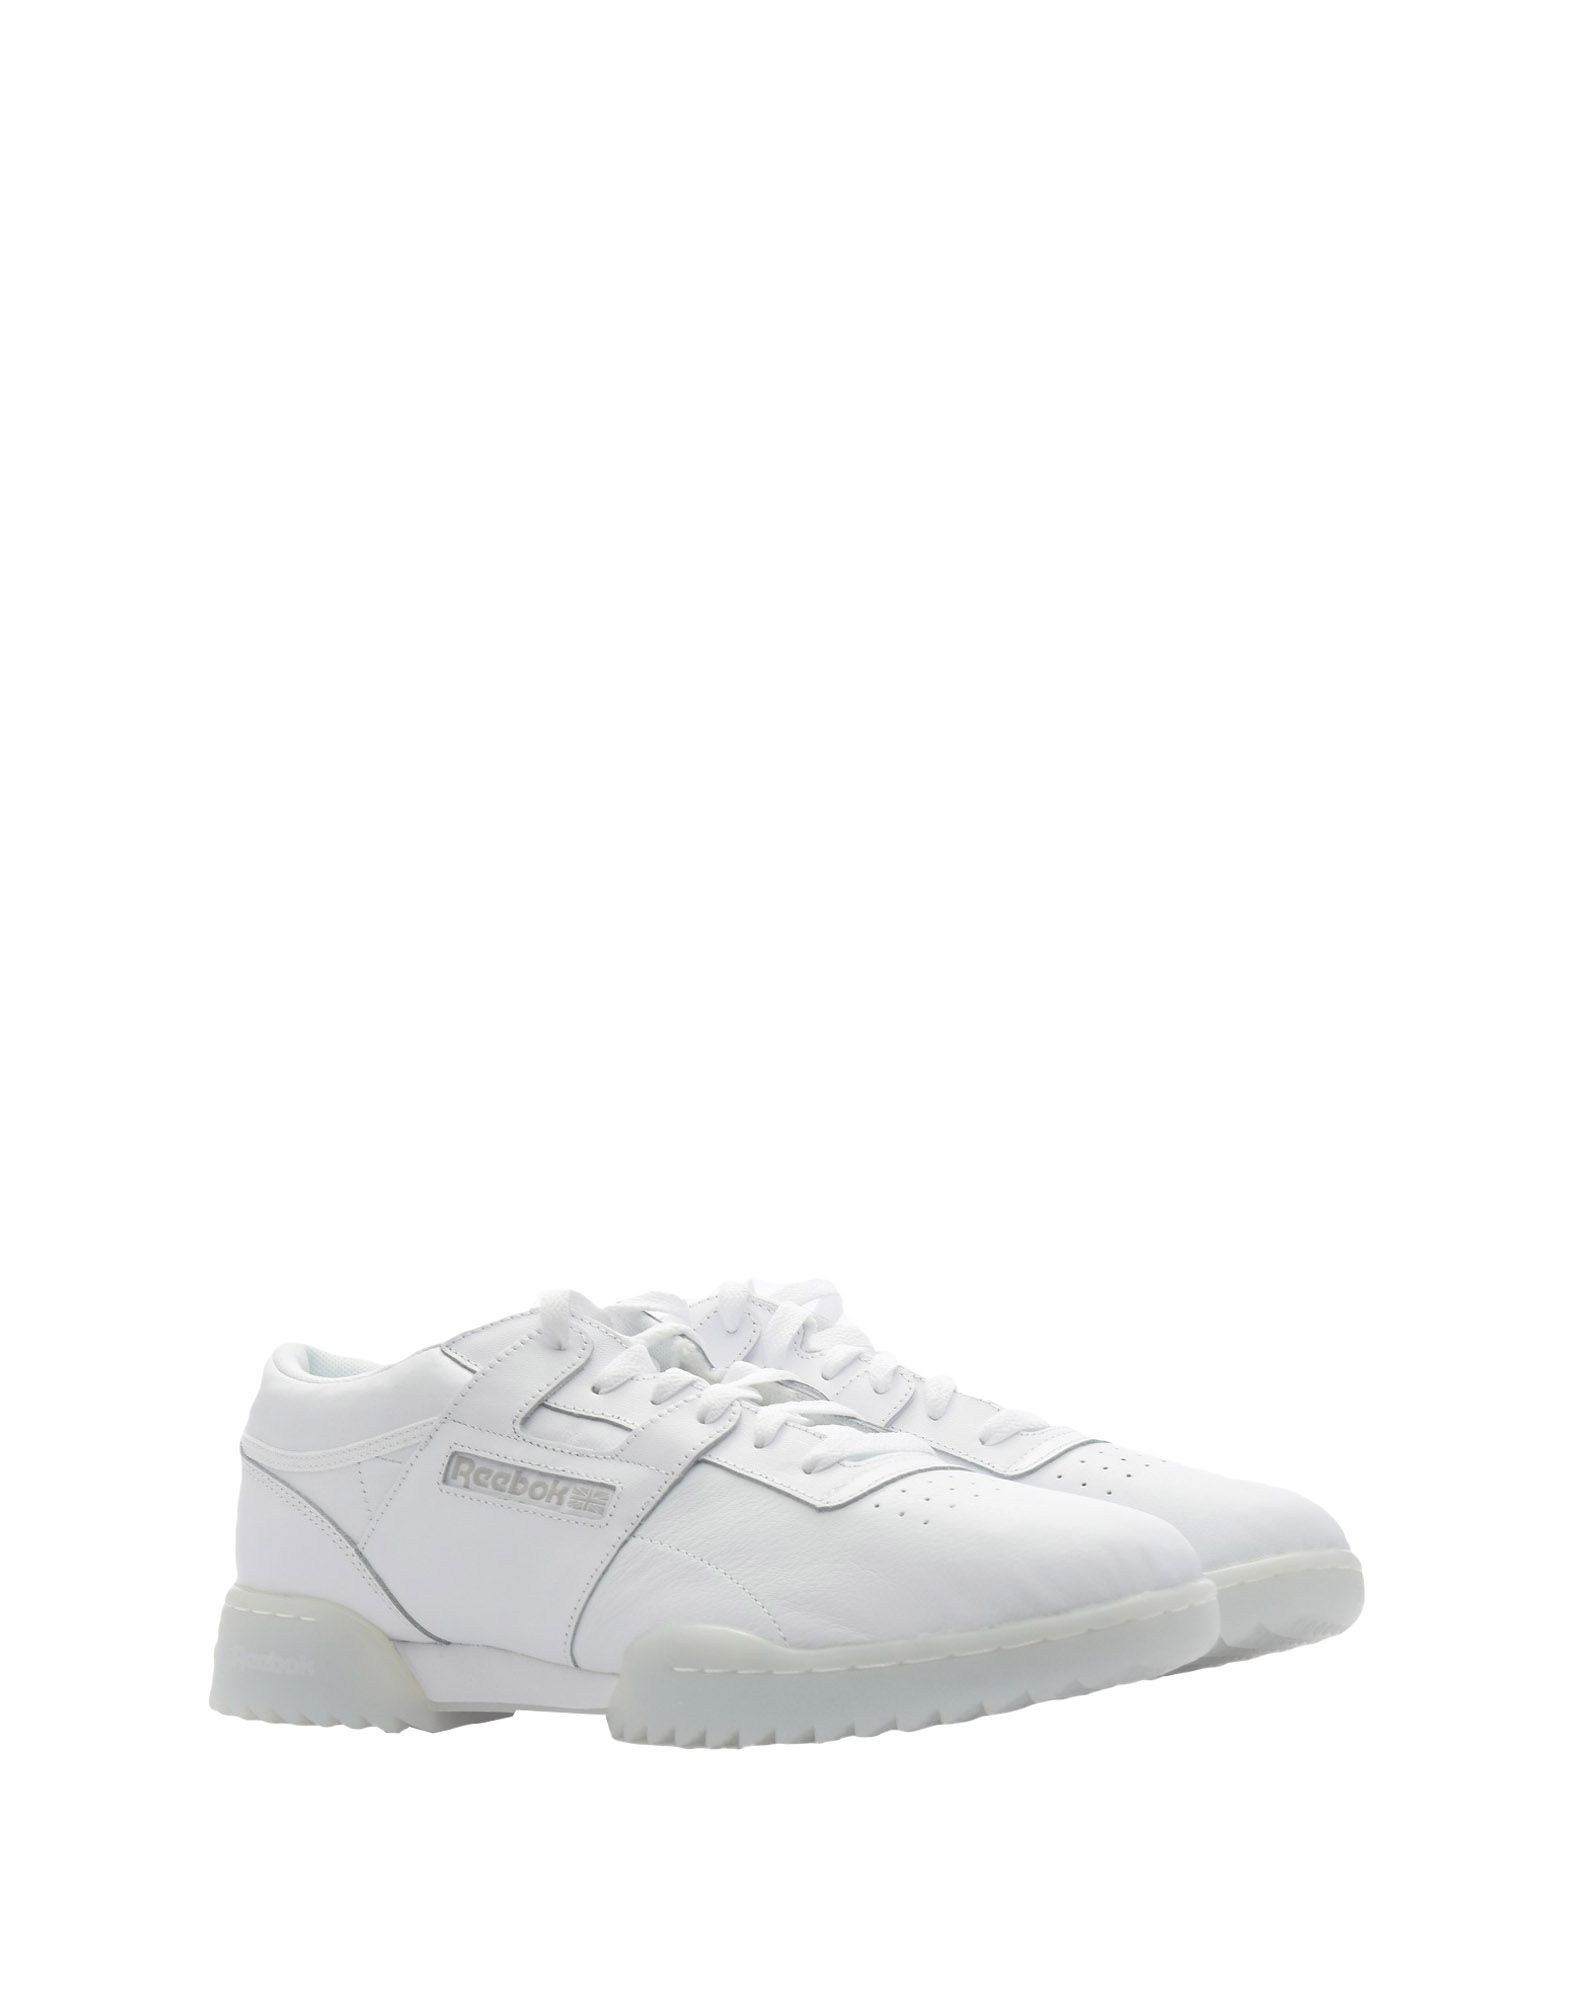 Sneakers Reebok Workout Clean Ripple - Homme - Sneakers Reebok sur